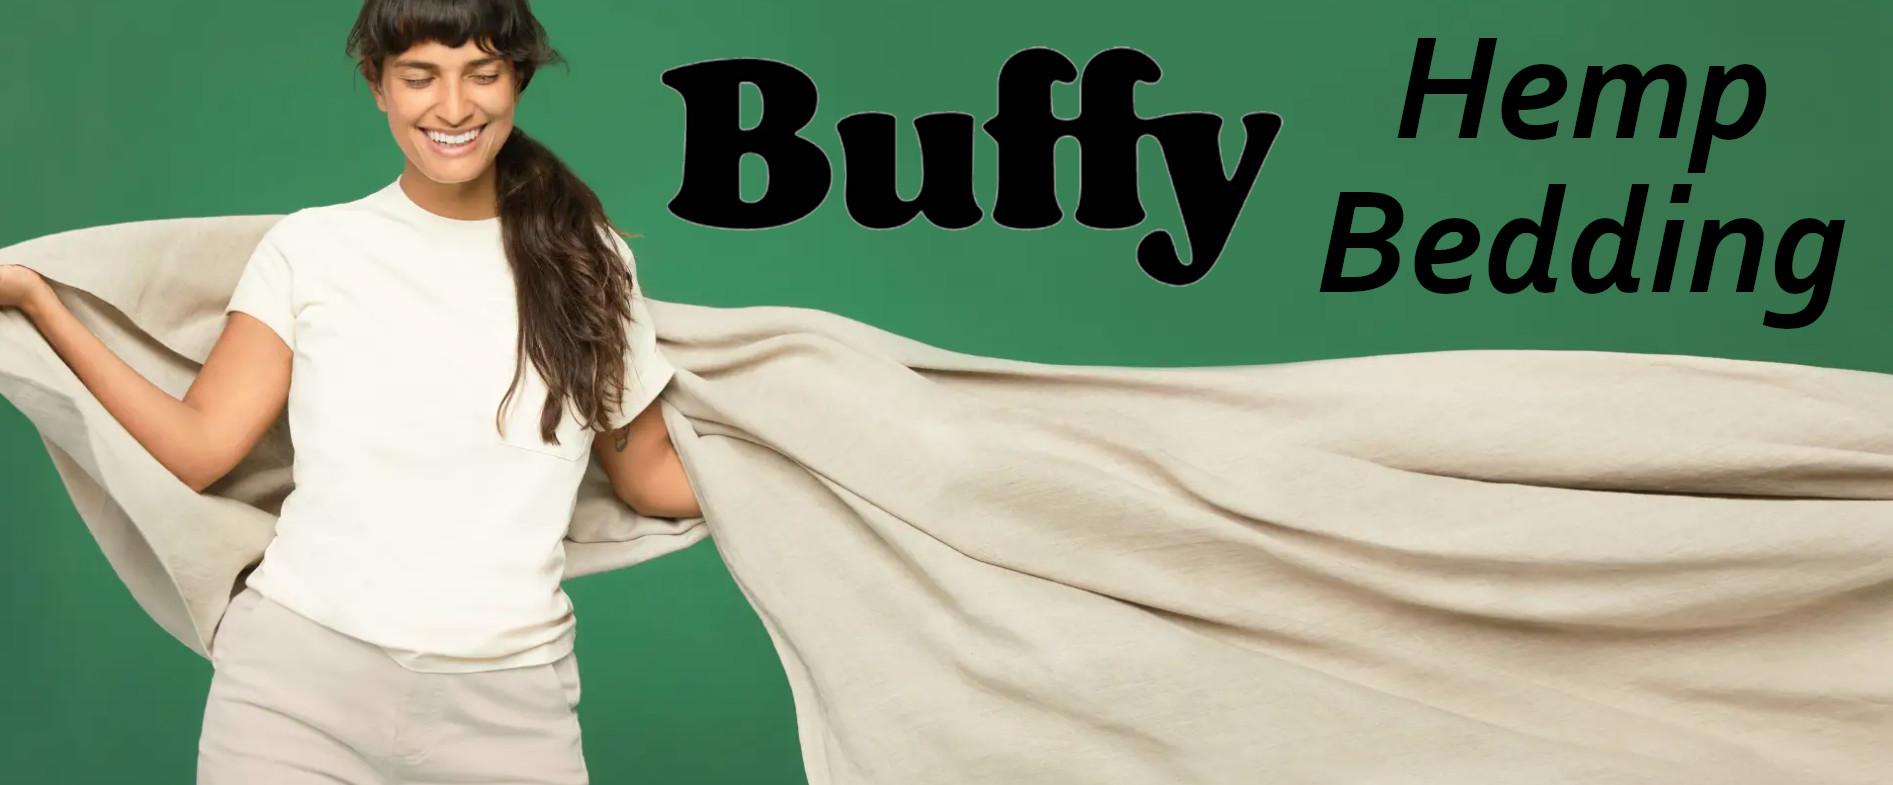 buffy hemp sheets review